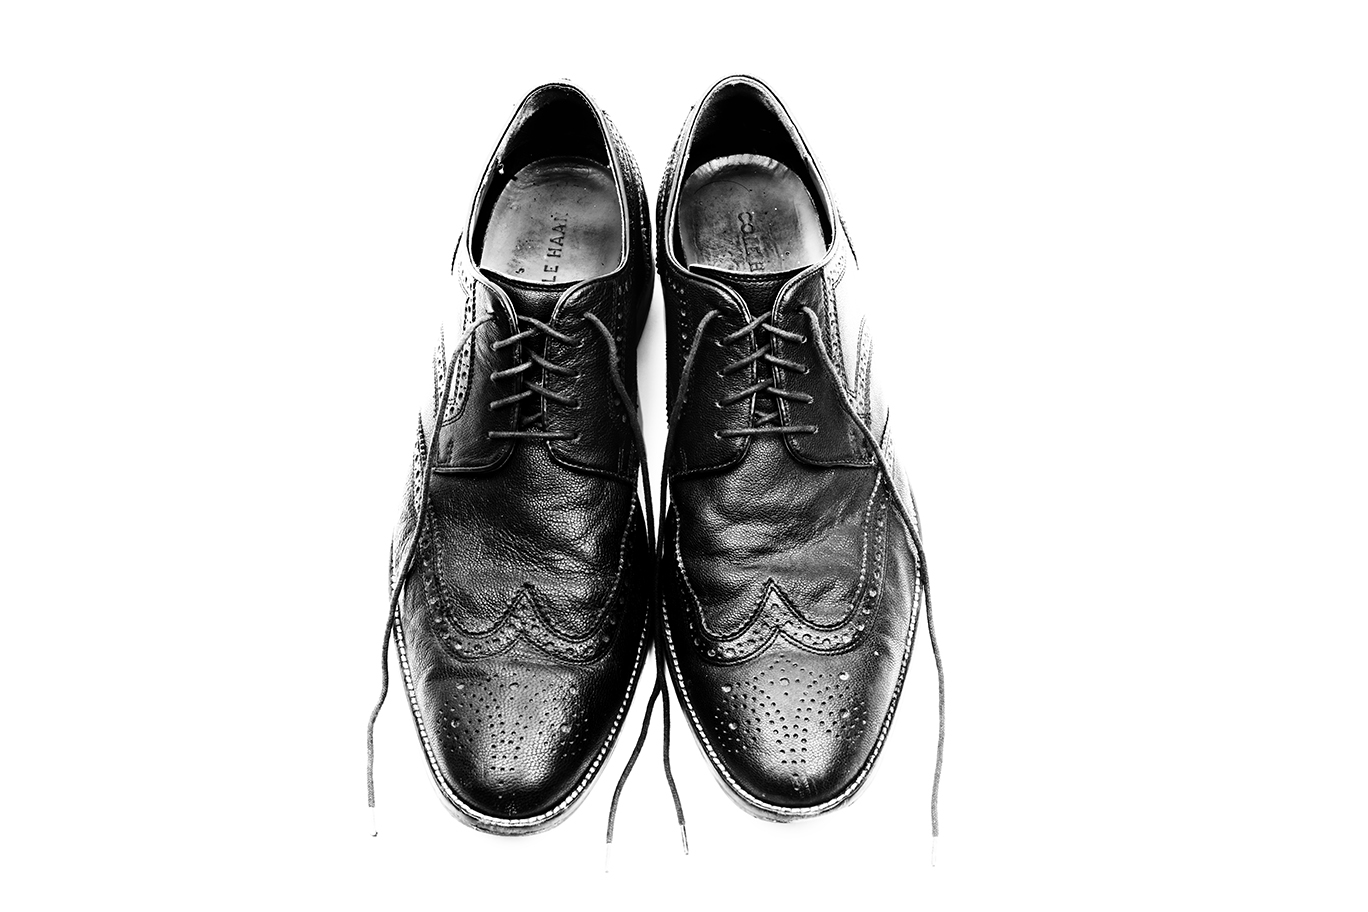 Untitled (My Dress Shoes, 2014-2016) , 2016, Digital Photograph